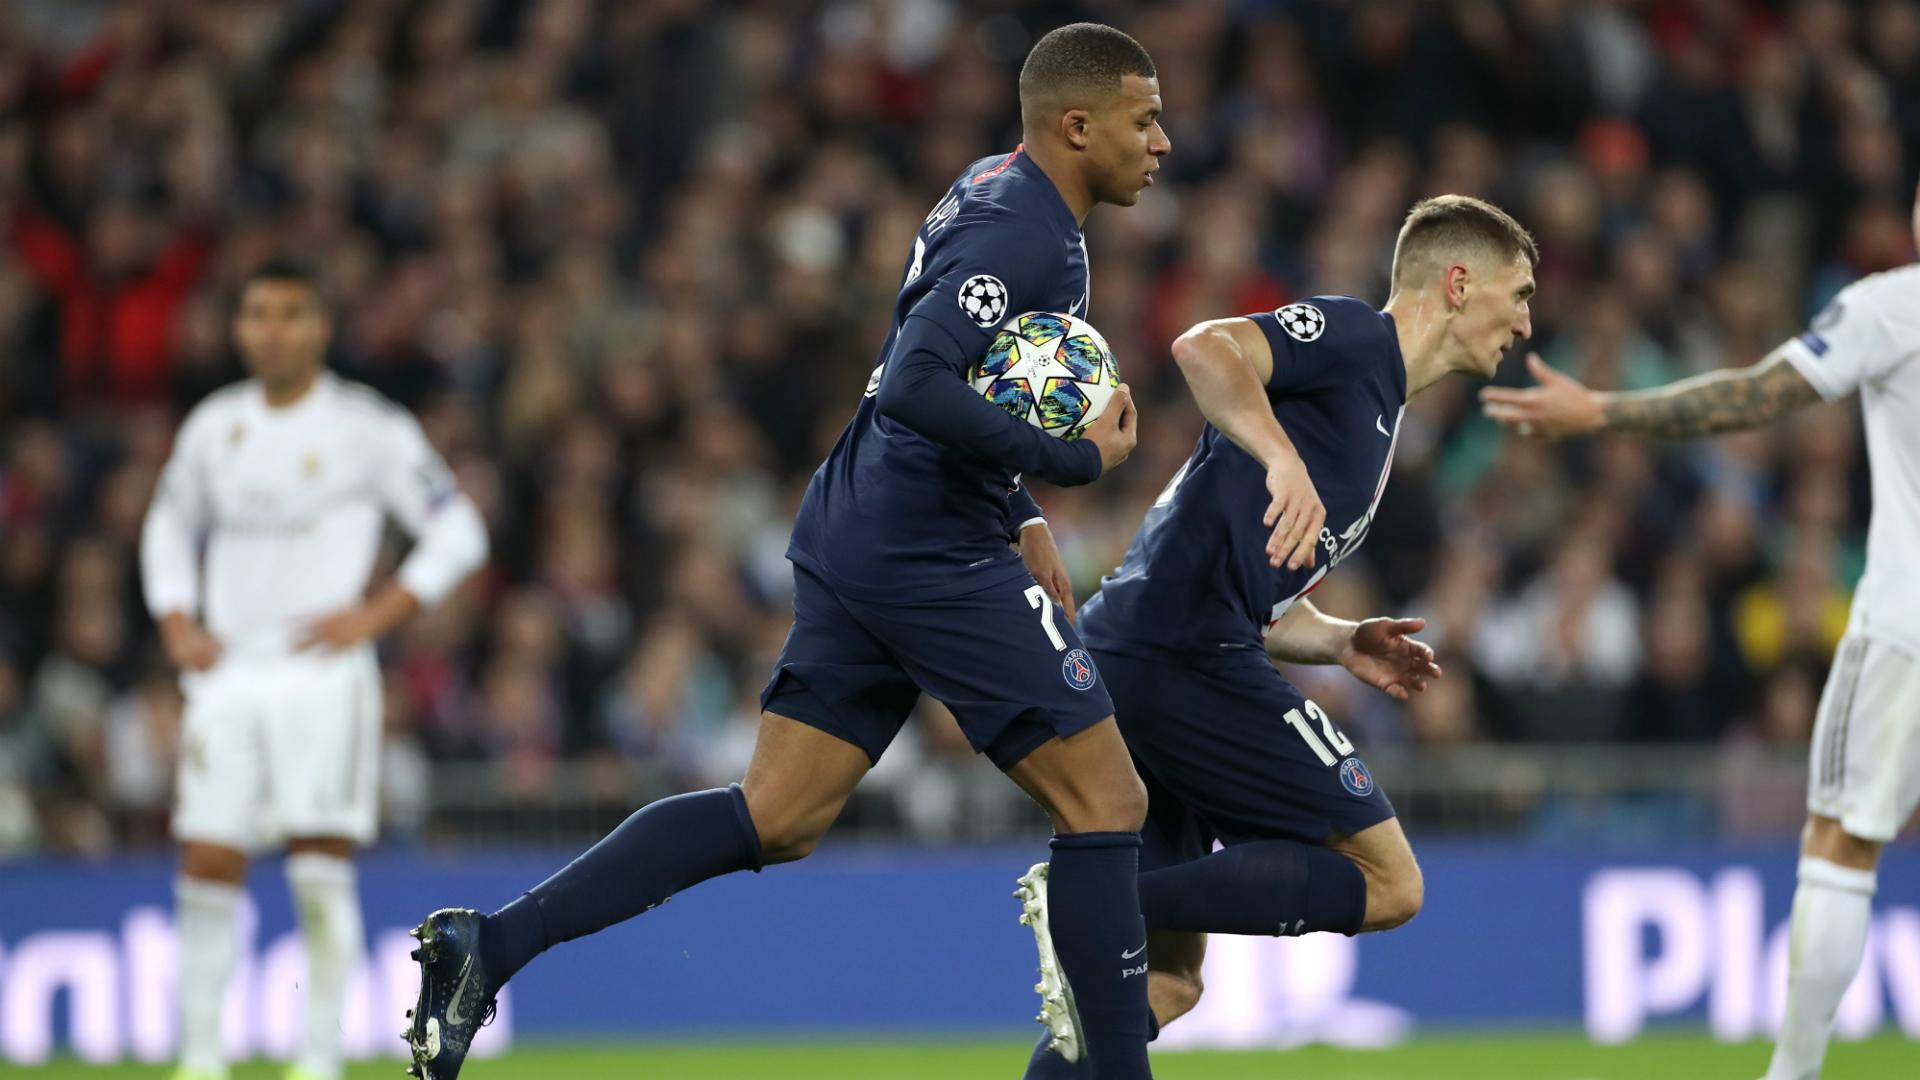 Real Madrid 2-2 Paris Saint-Germain: Mbappe and Sarabia late show seals top spot